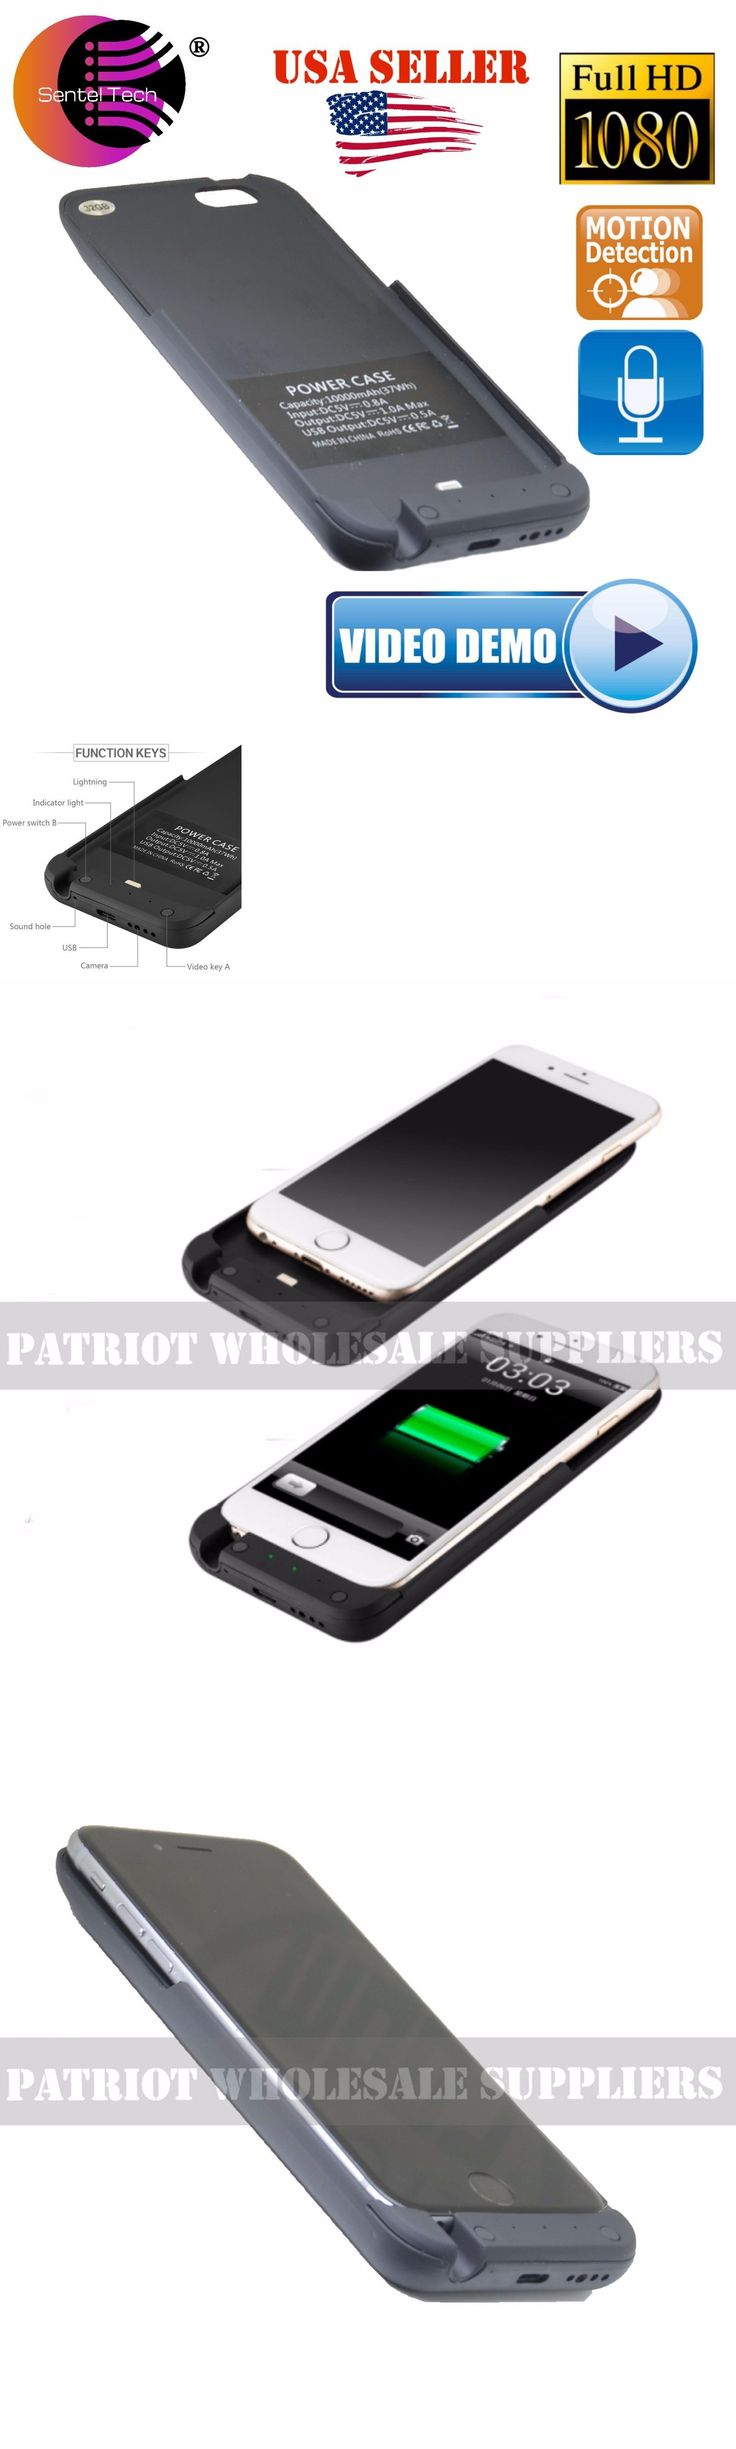 Surveillance Gadgets: 1080P Hidden Spy Camera Iphone Battery Case Ac Charger Dvr 32Gb Surveillance Pen BUY IT NOW ONLY: $99.99